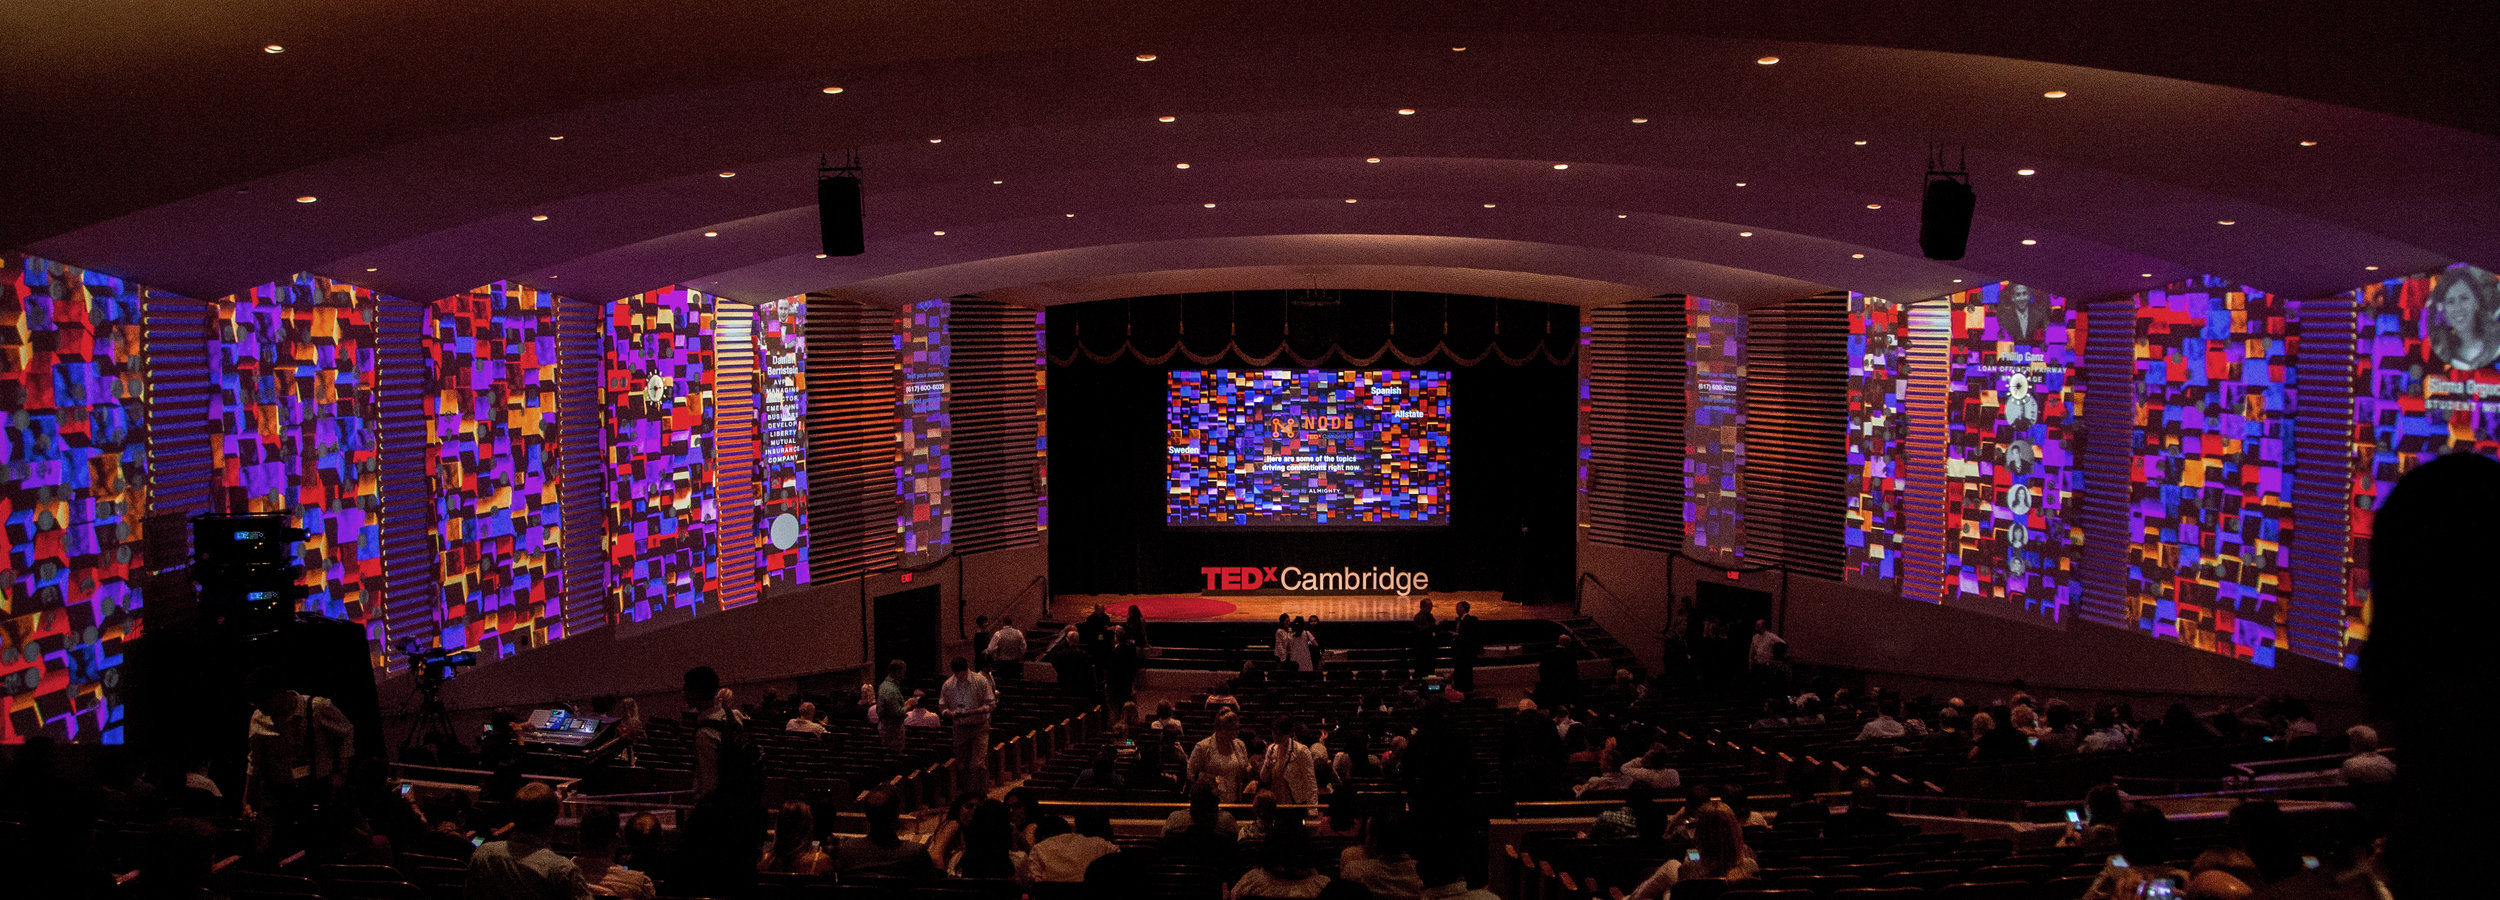 Tedx_Cubes.jpg